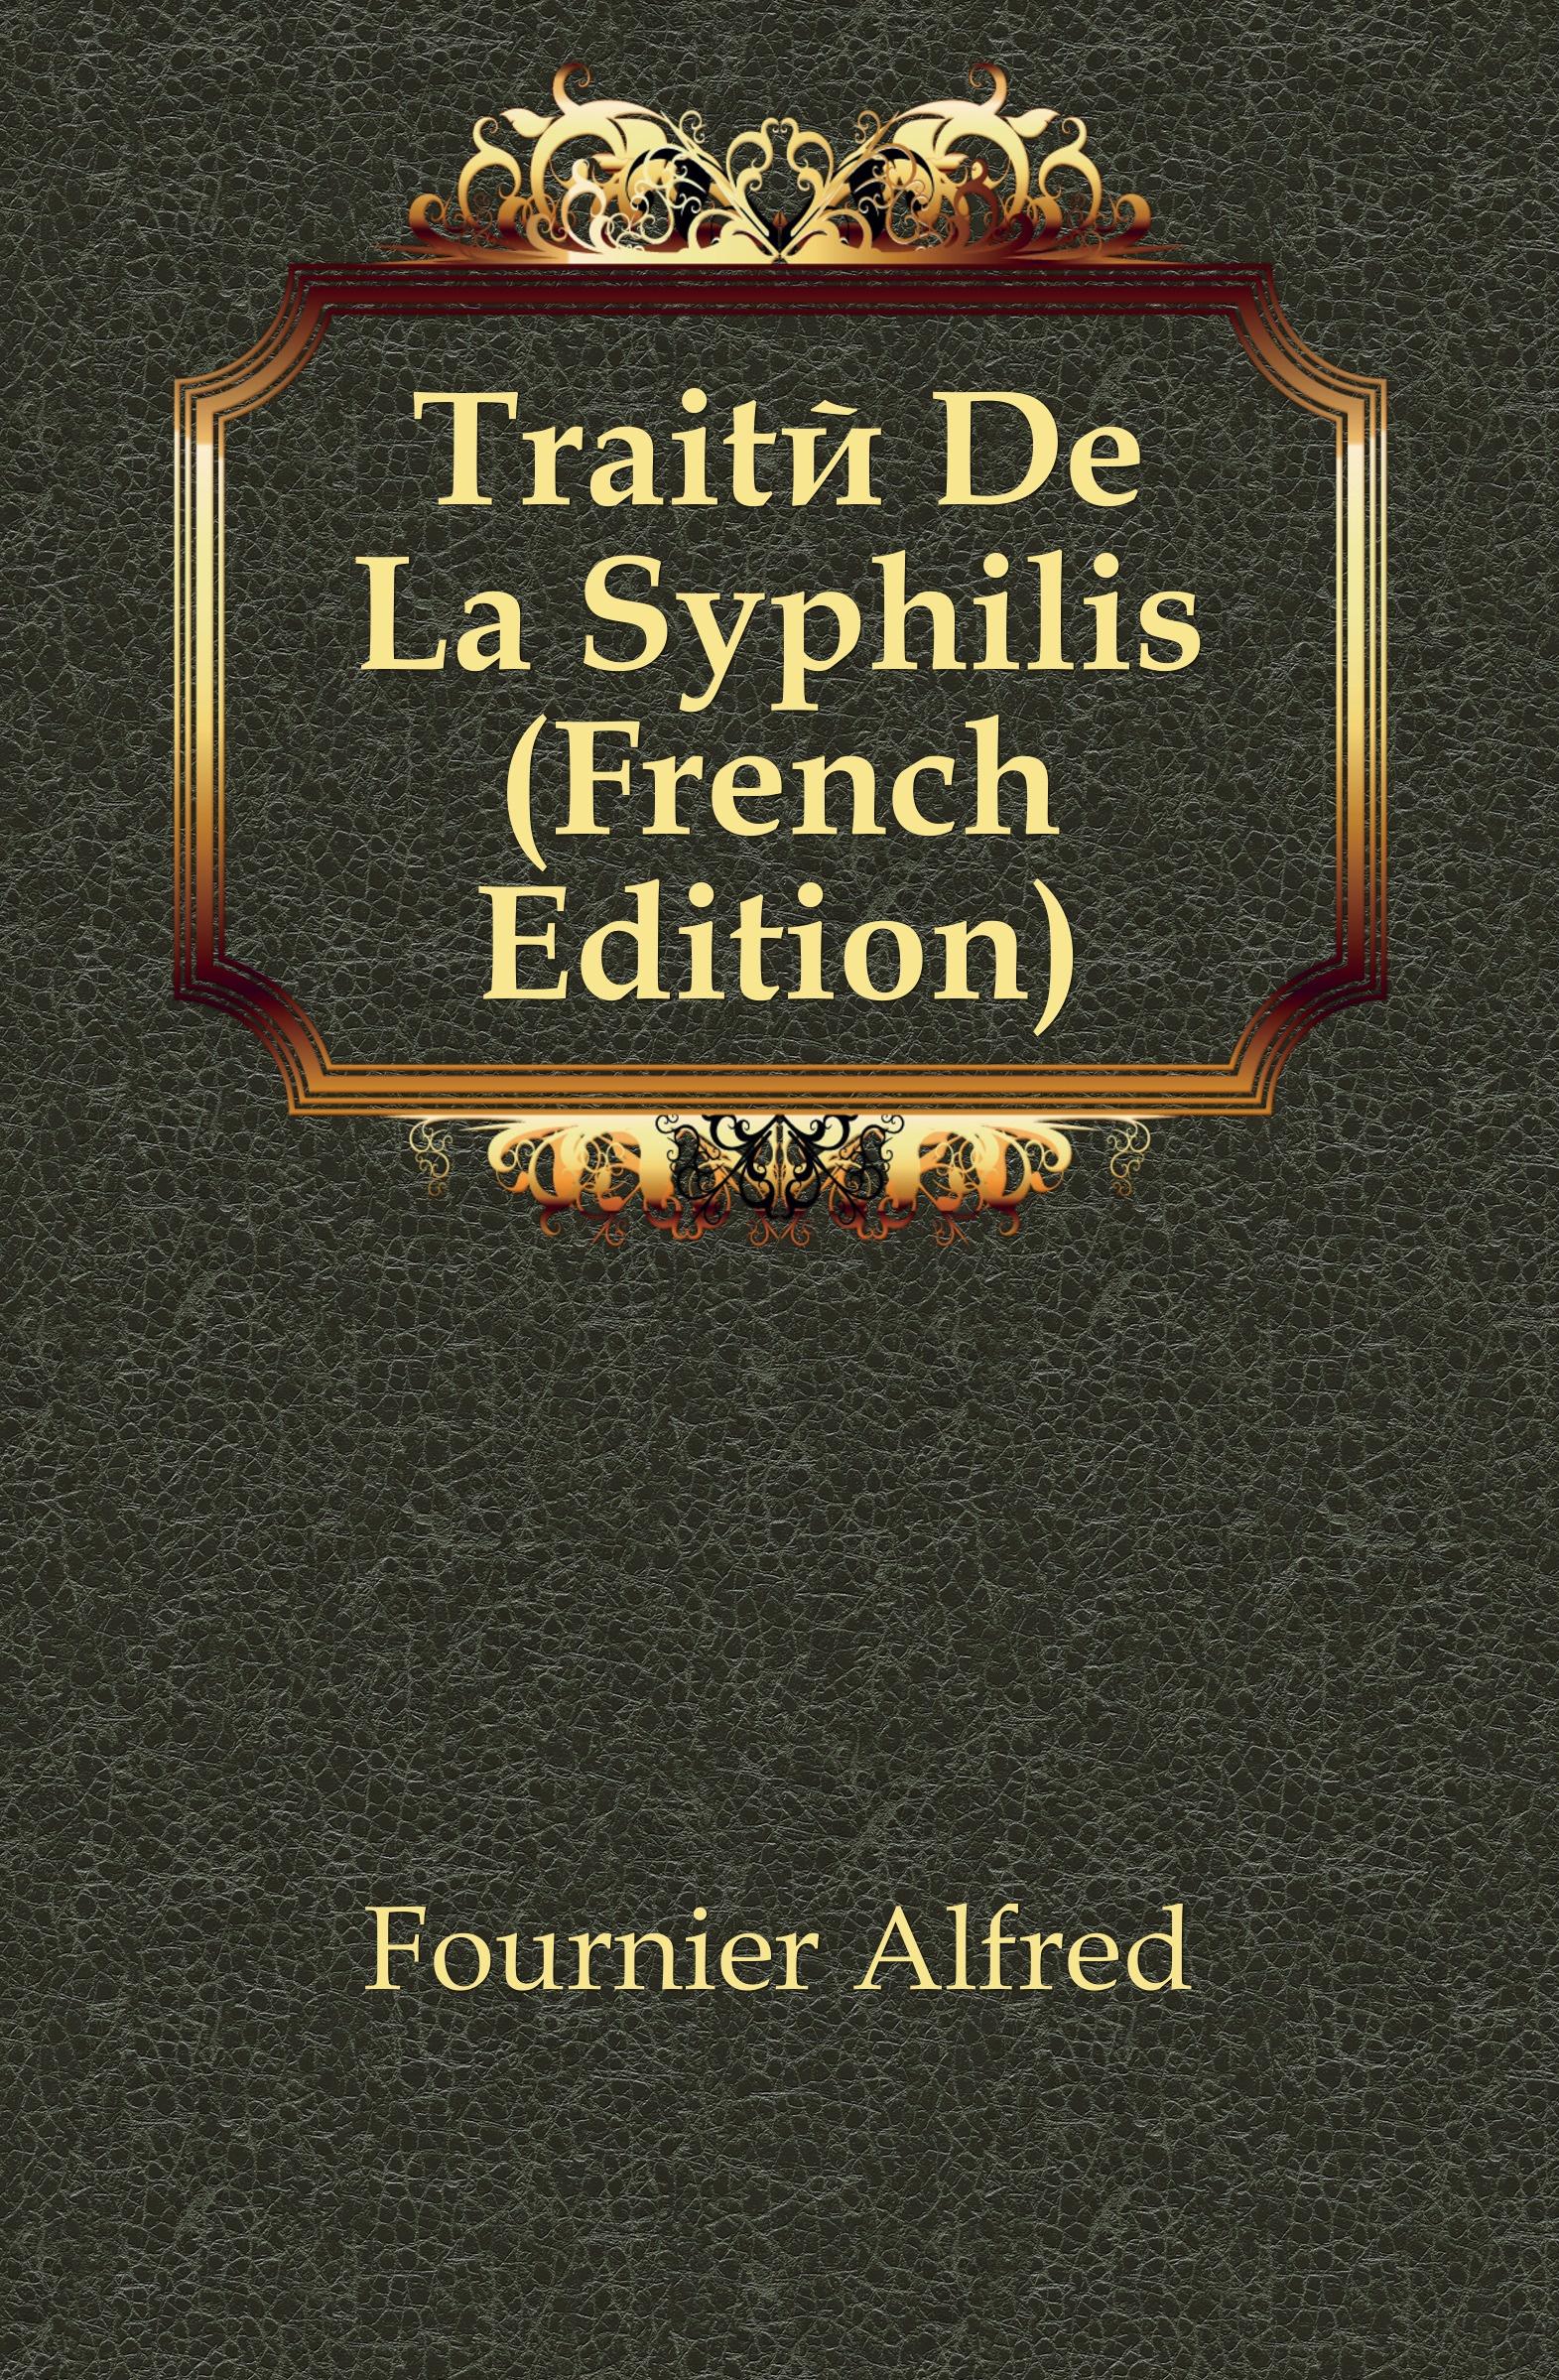 Fournier Alfred Traite De La Syphilis (French Edition) henri fournier traite de la typographie classic reprint